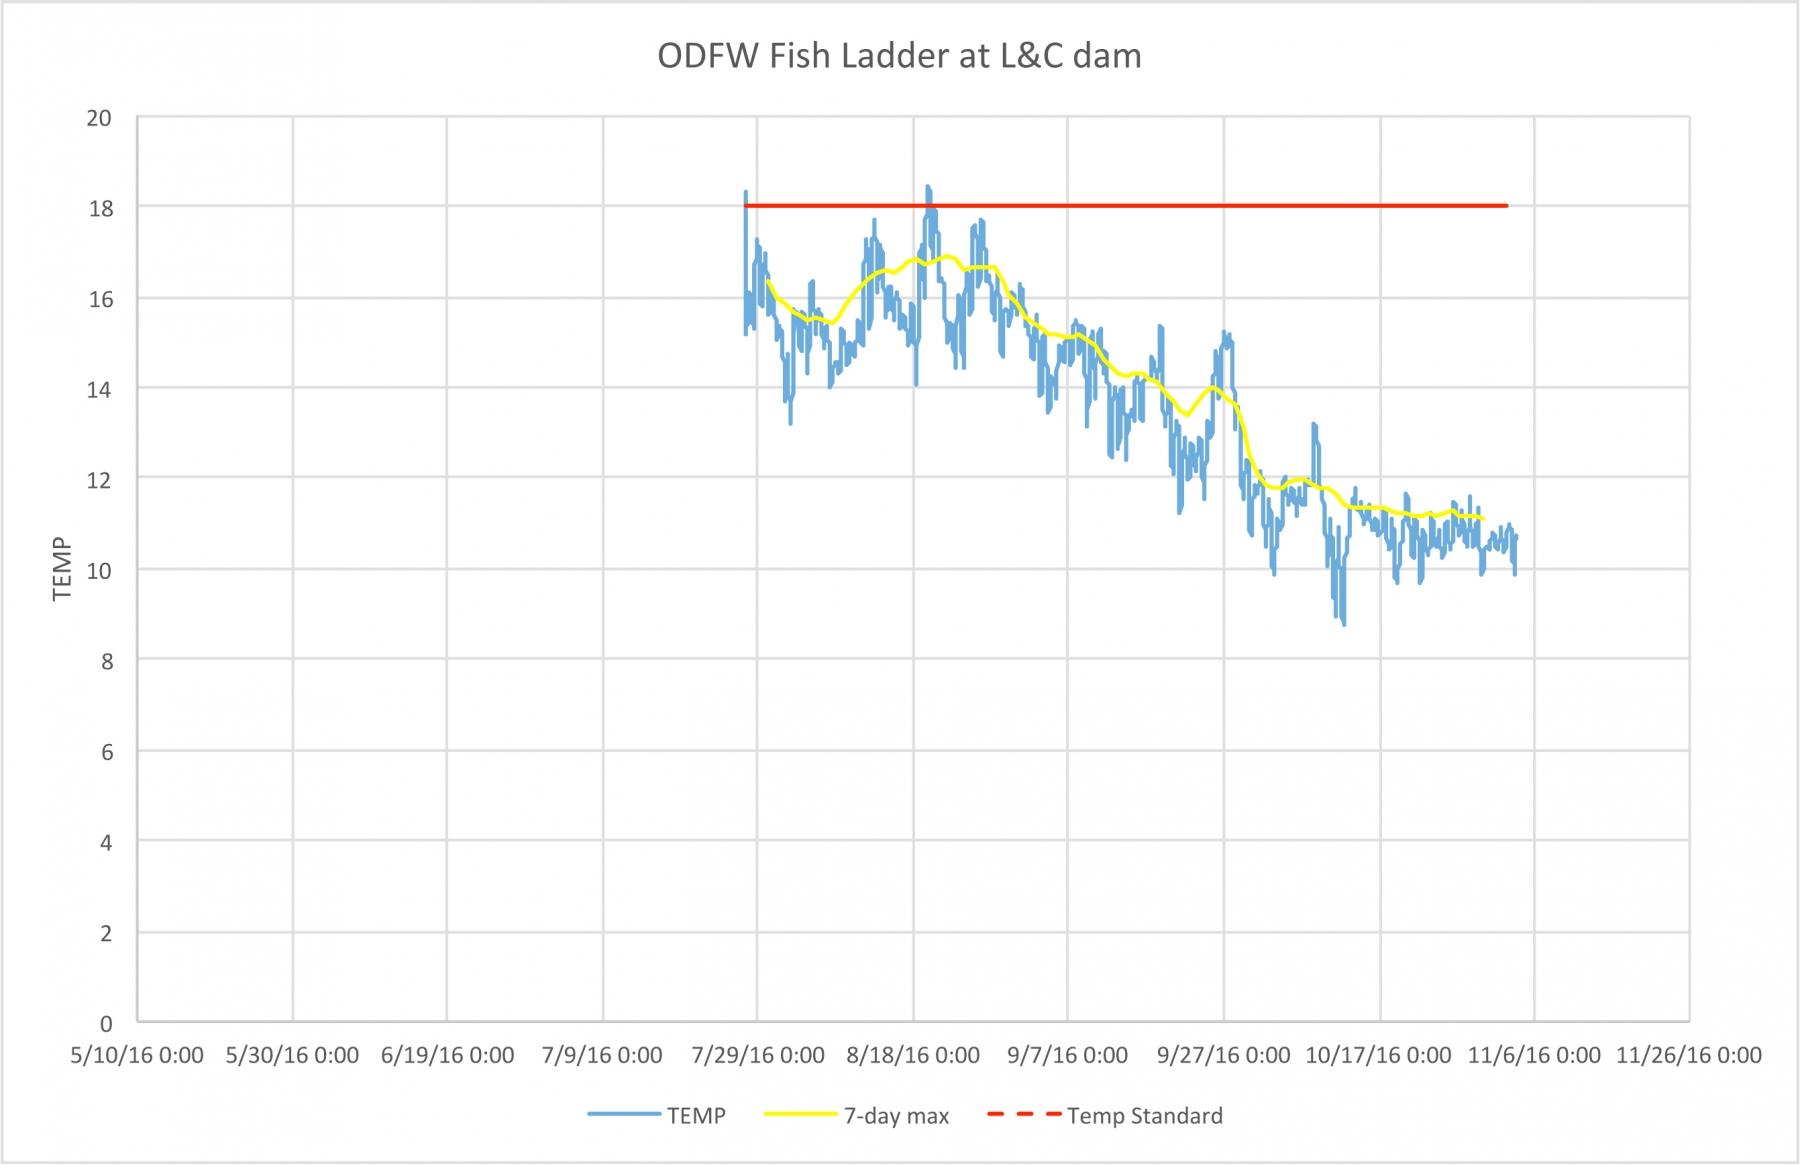 lewis & clark river at odfw fish ladder 2016